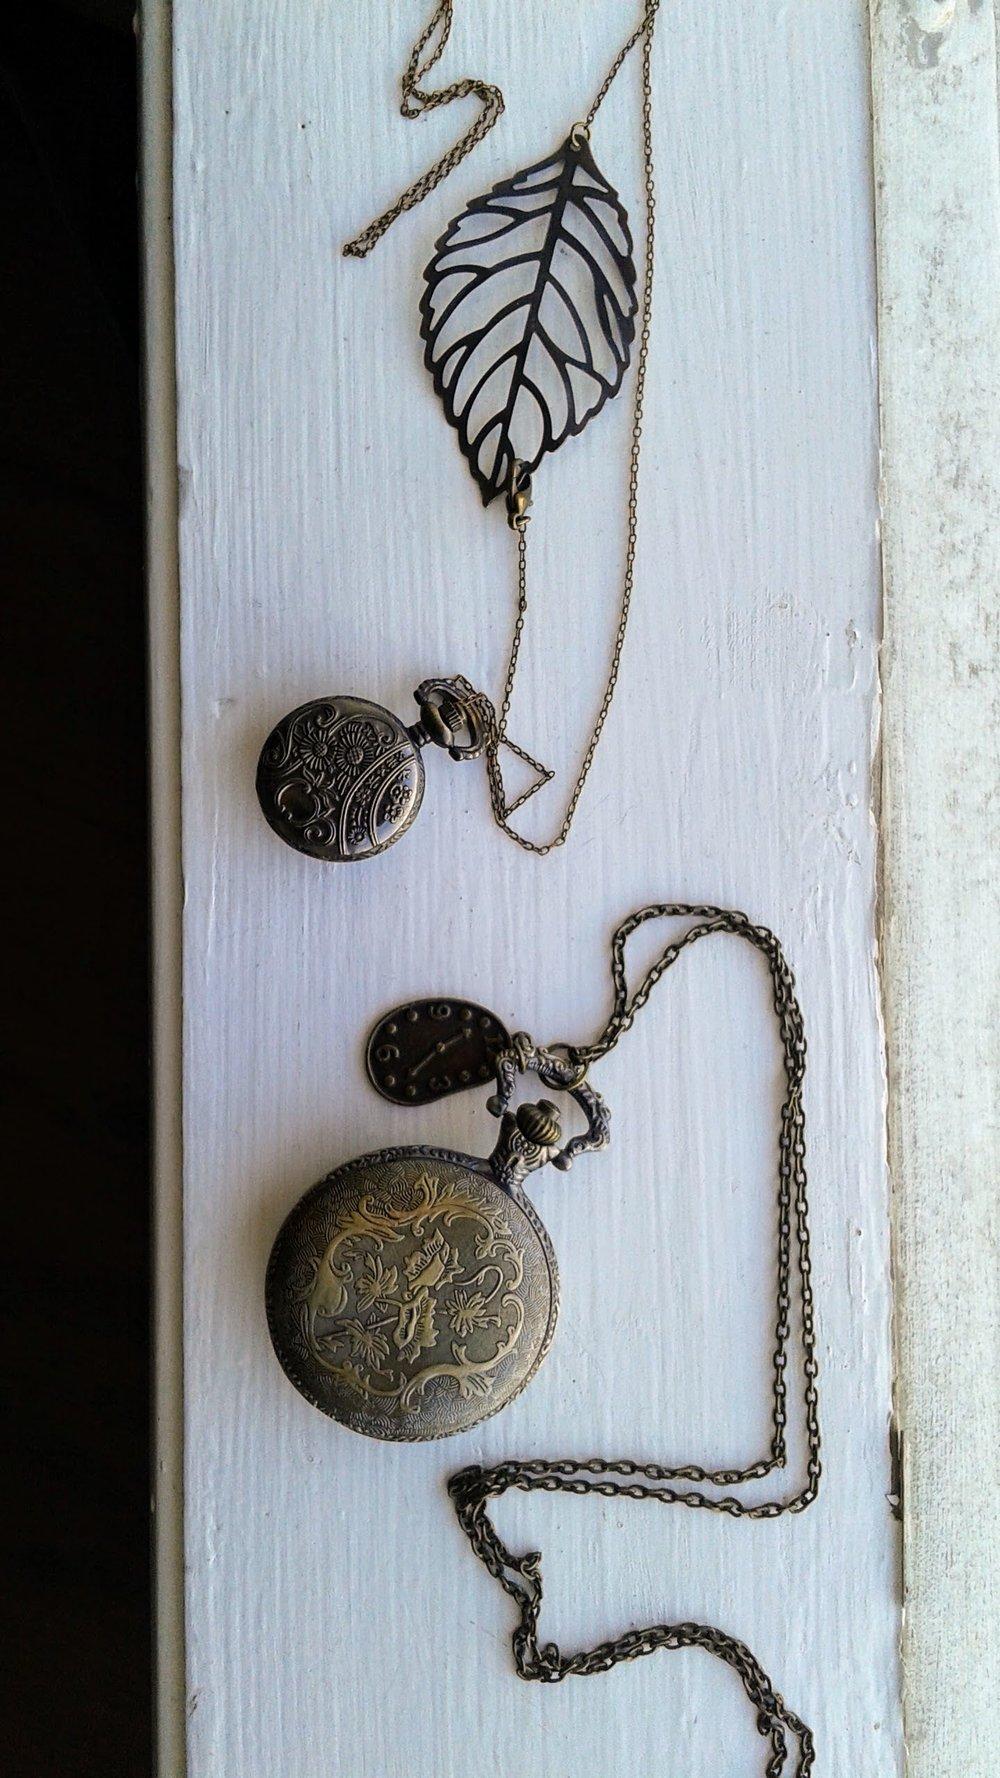 Small pendant, $18; Large pendant, $20